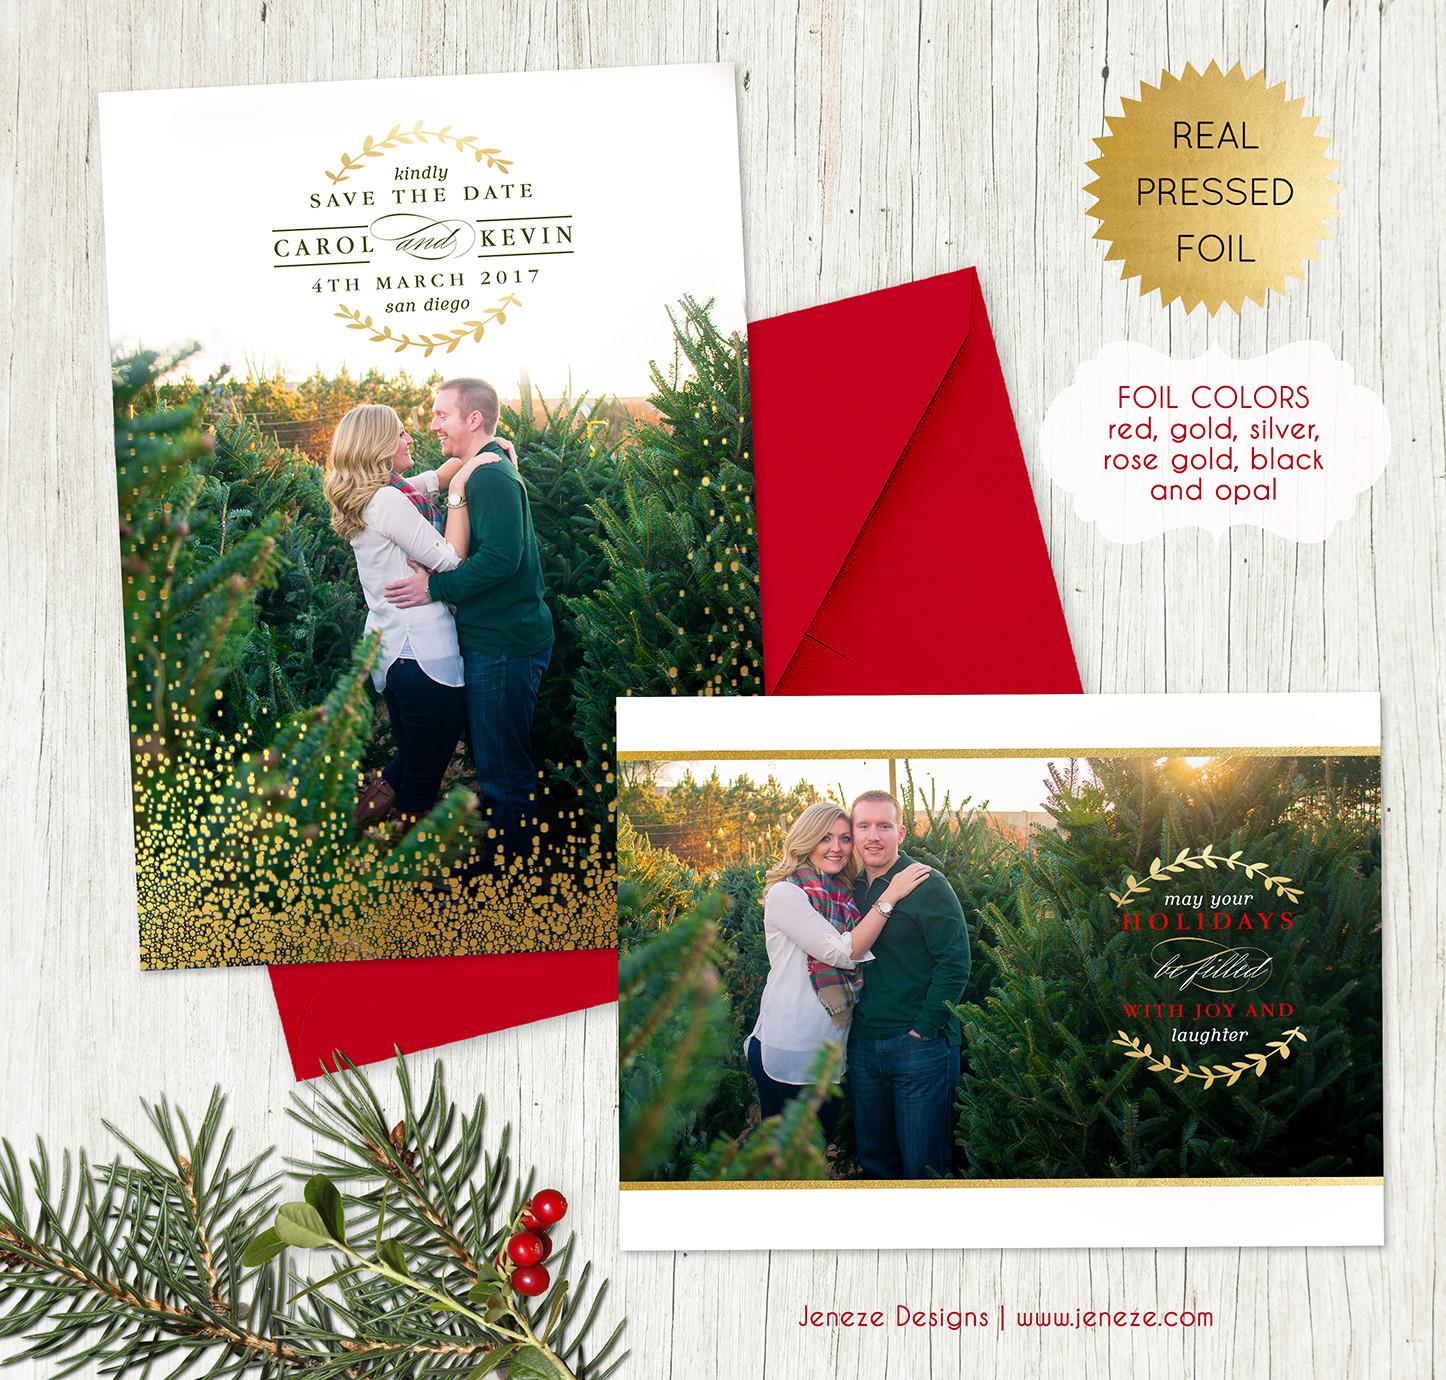 Save the Date - Item# SD114 | Jeneze Designs Custom Wedding Invitations